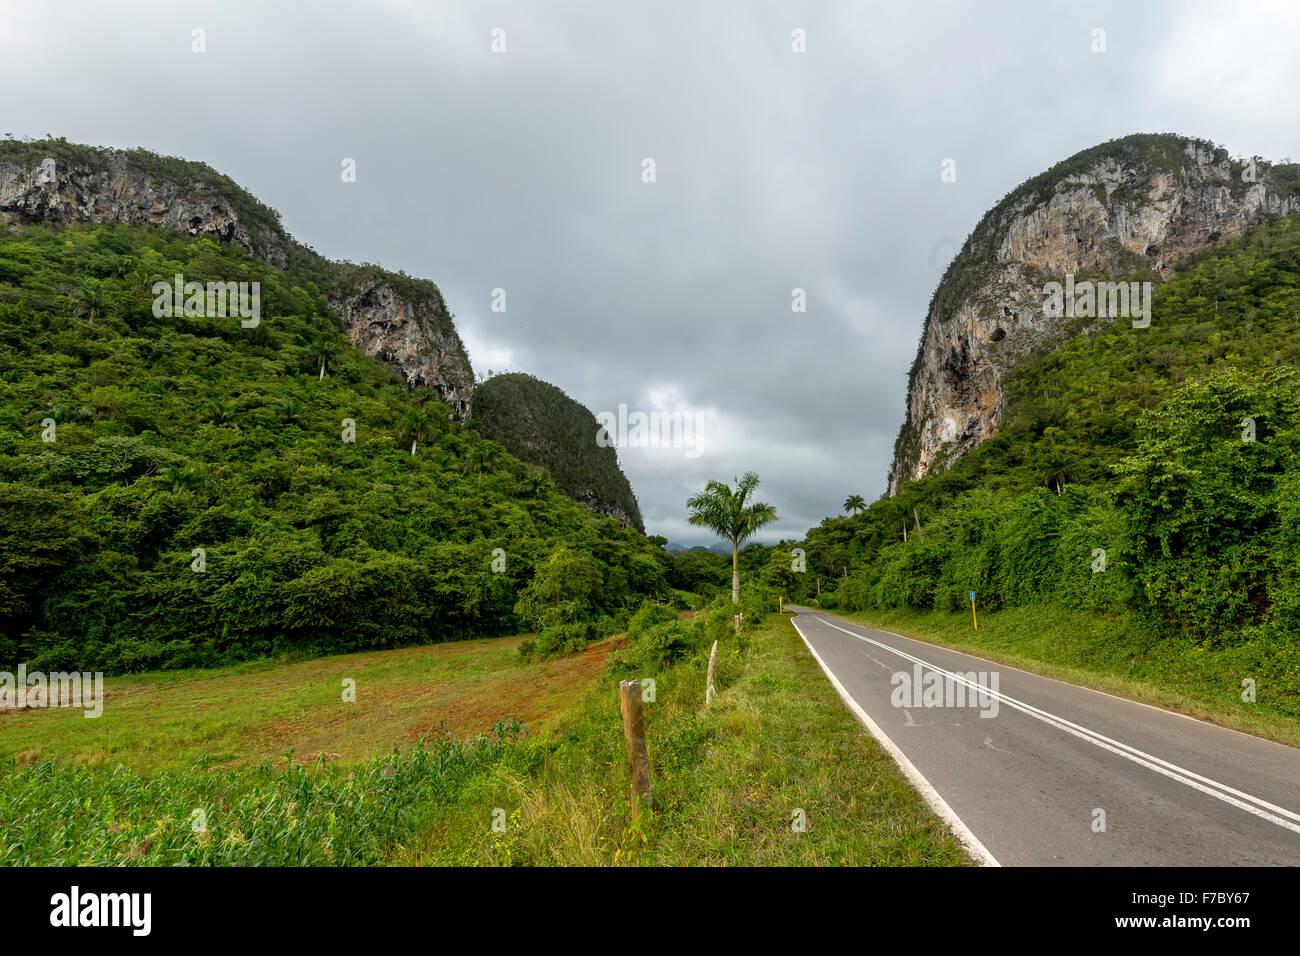 Country road with median strip in Vinales, karst mountain in the Vinales Valley, Vinales, Cuba, Pinar del Rio, Cuba, Stock Photo